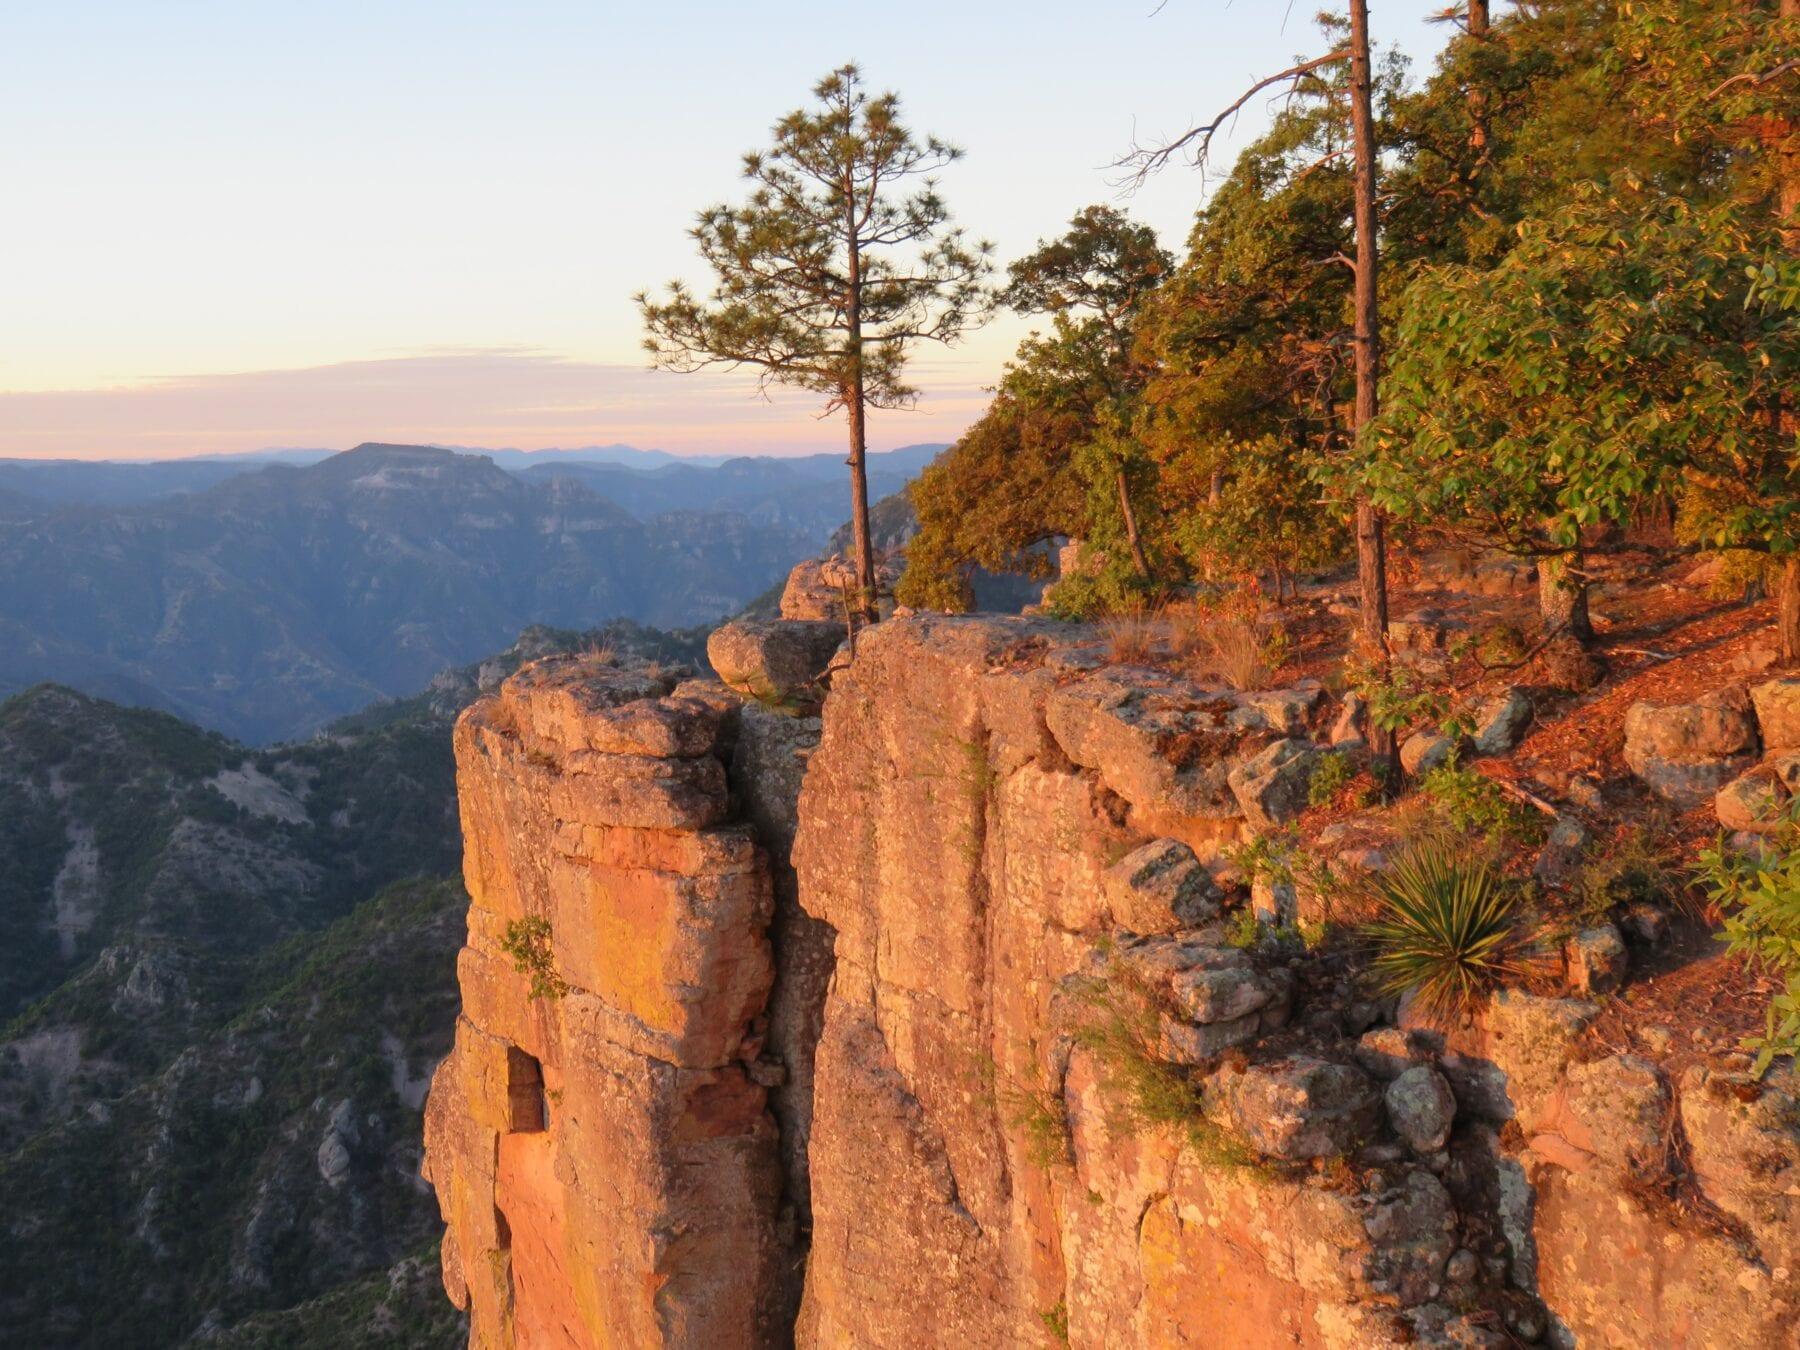 Koperen Canyon